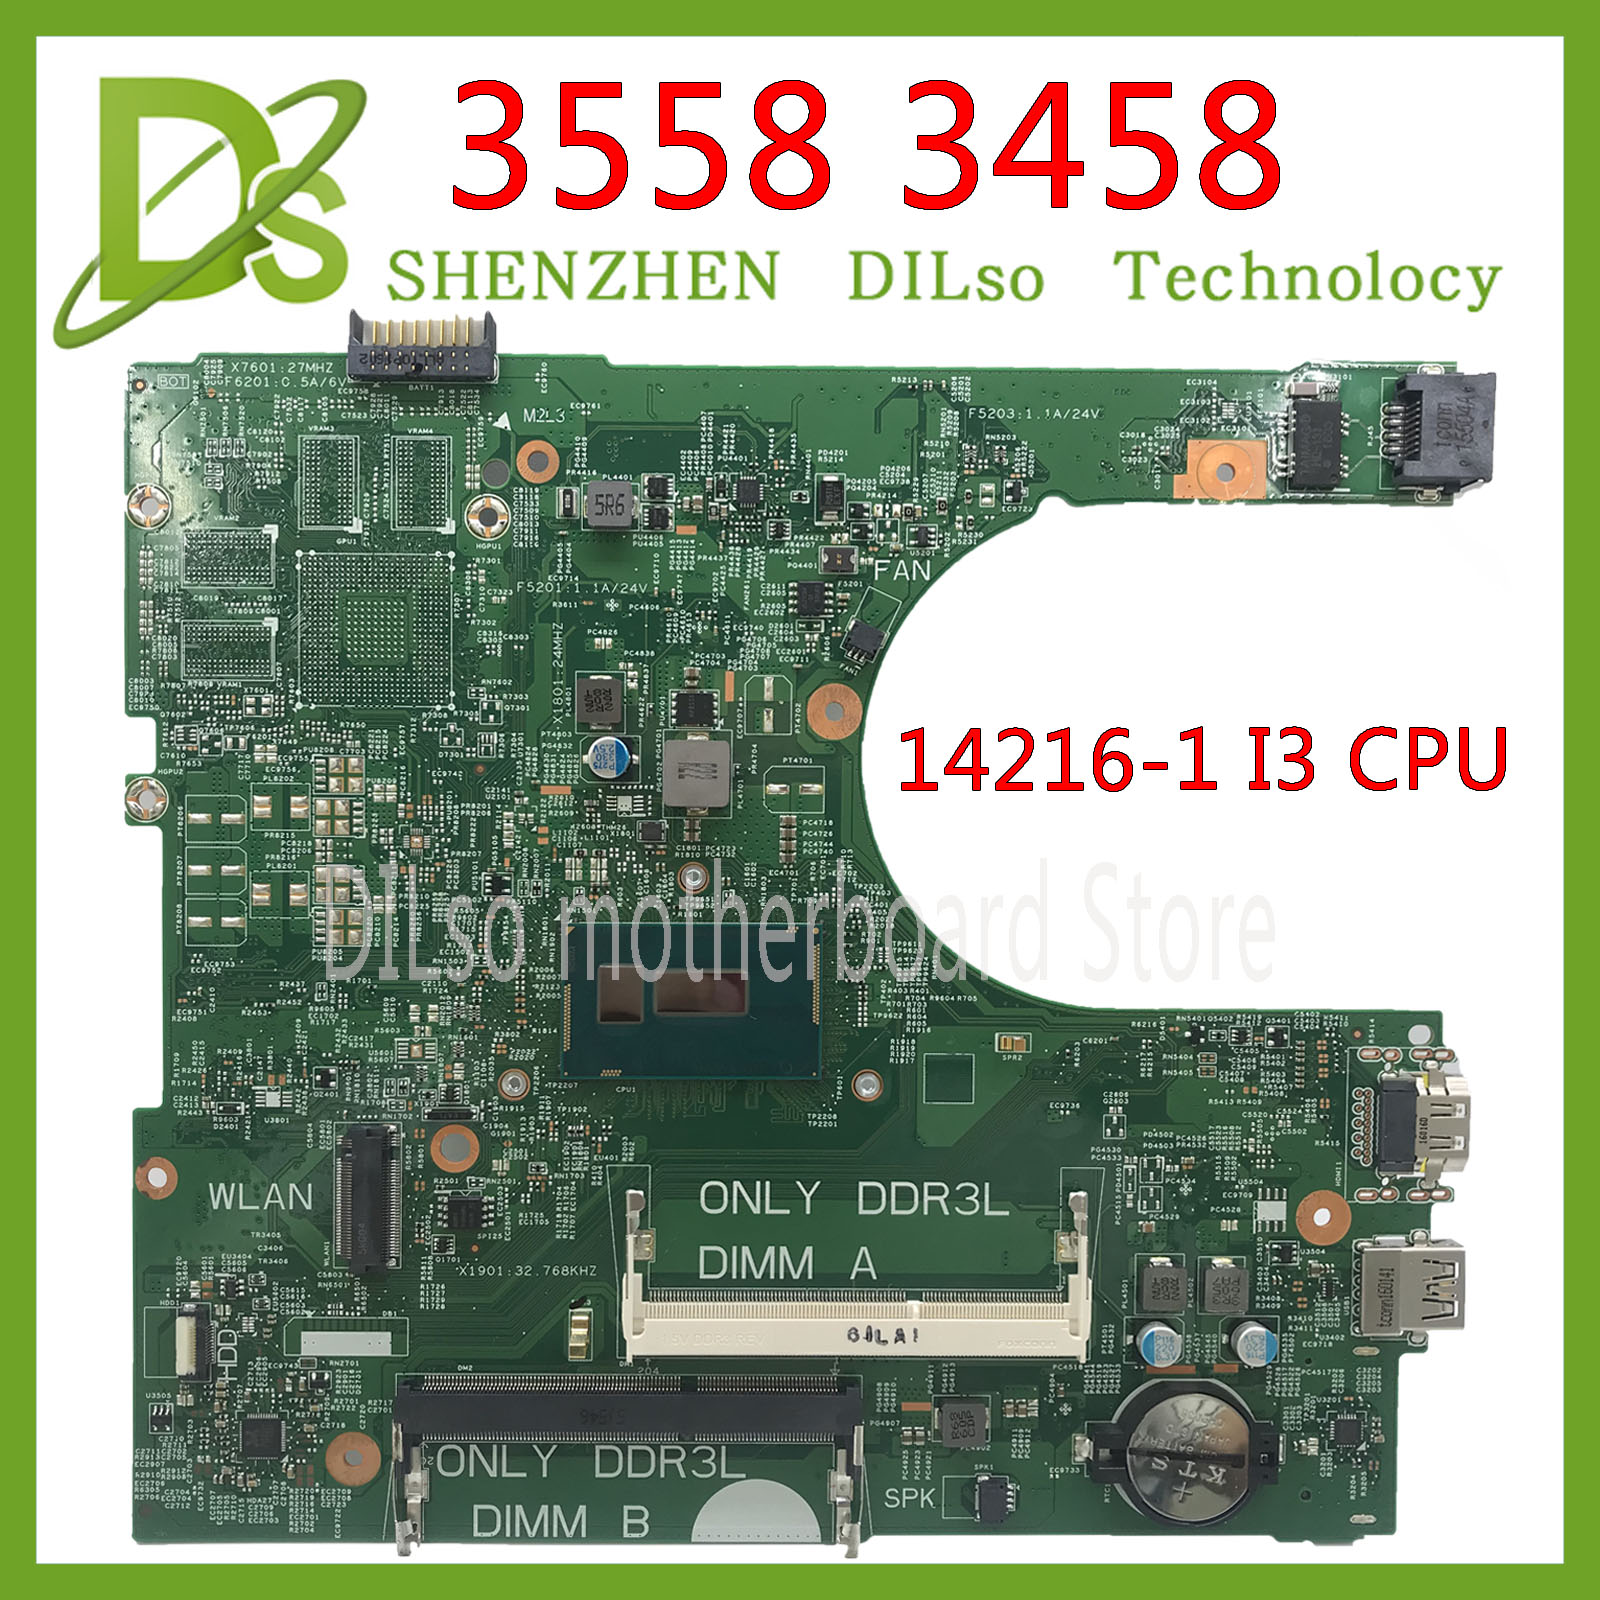 KEFU 14216-1 CN-0CW4DH  For Dell Inspiron 3558 3458 Motherboard I3 Cpu 14216-1 PWB:1XVKN REV:A00 Original Test 100% Work